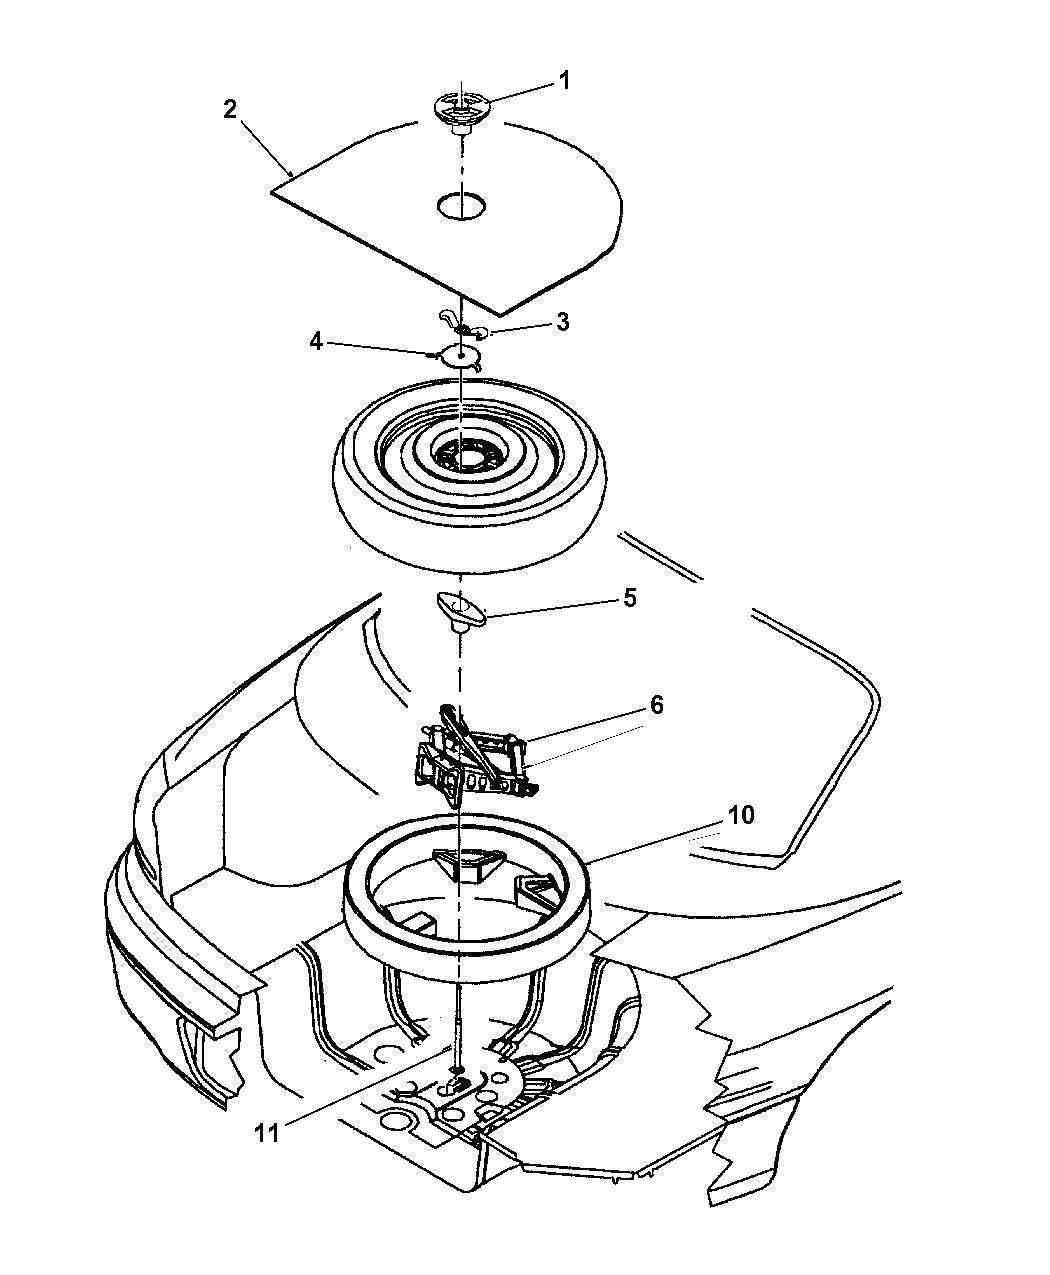 2000 Chrysler 300m Jack Spare Tire Stowage Mopar Parts Giant Timing Belt